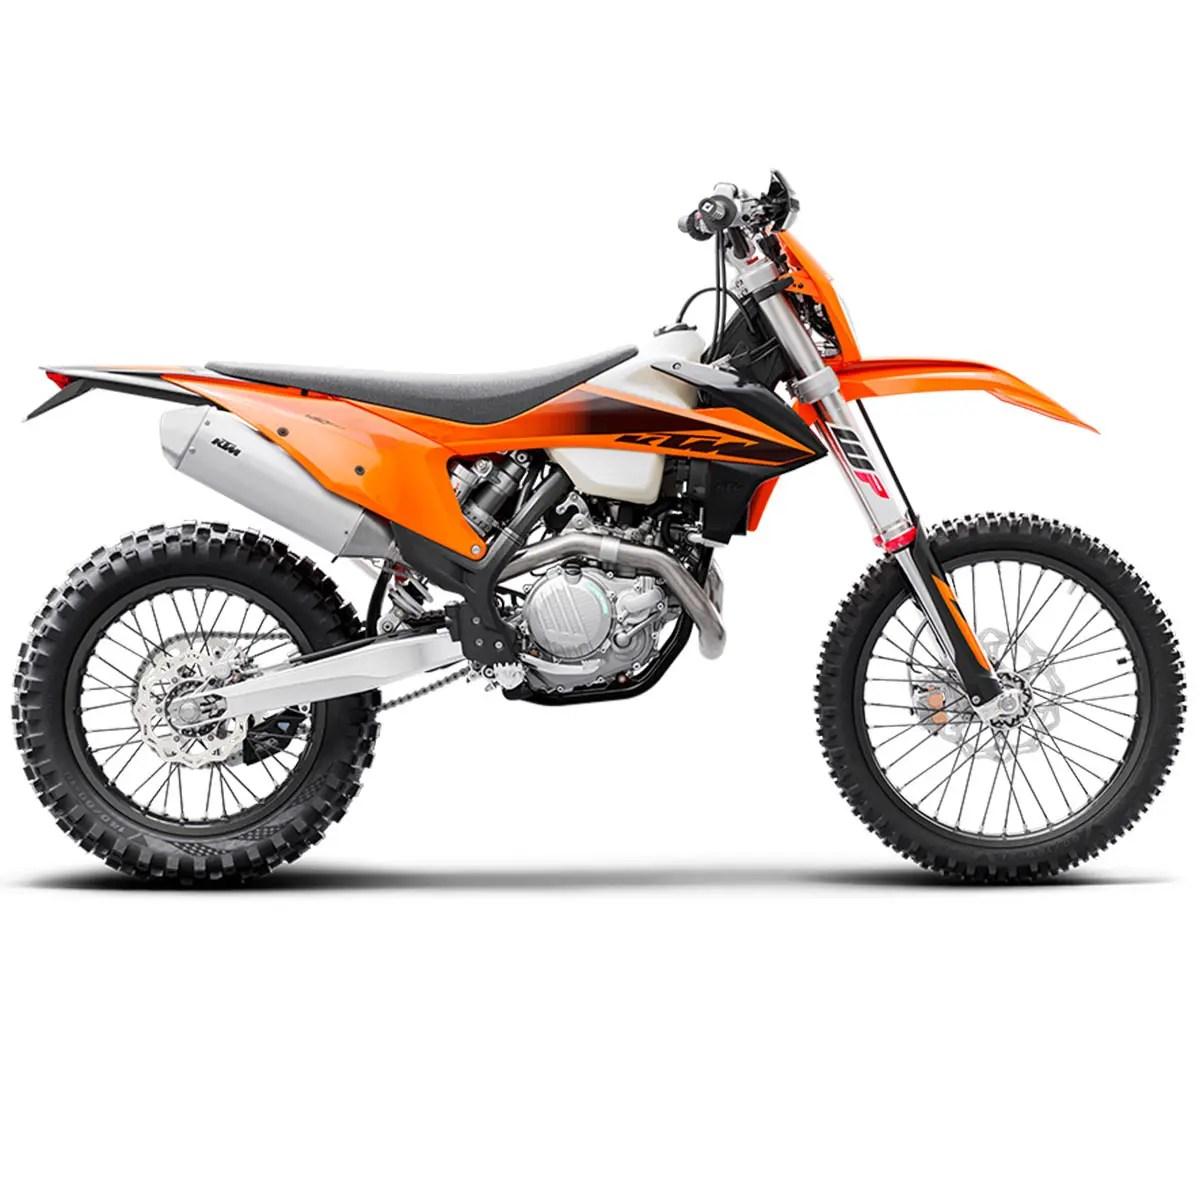 KTM-450-EXC-F-2020